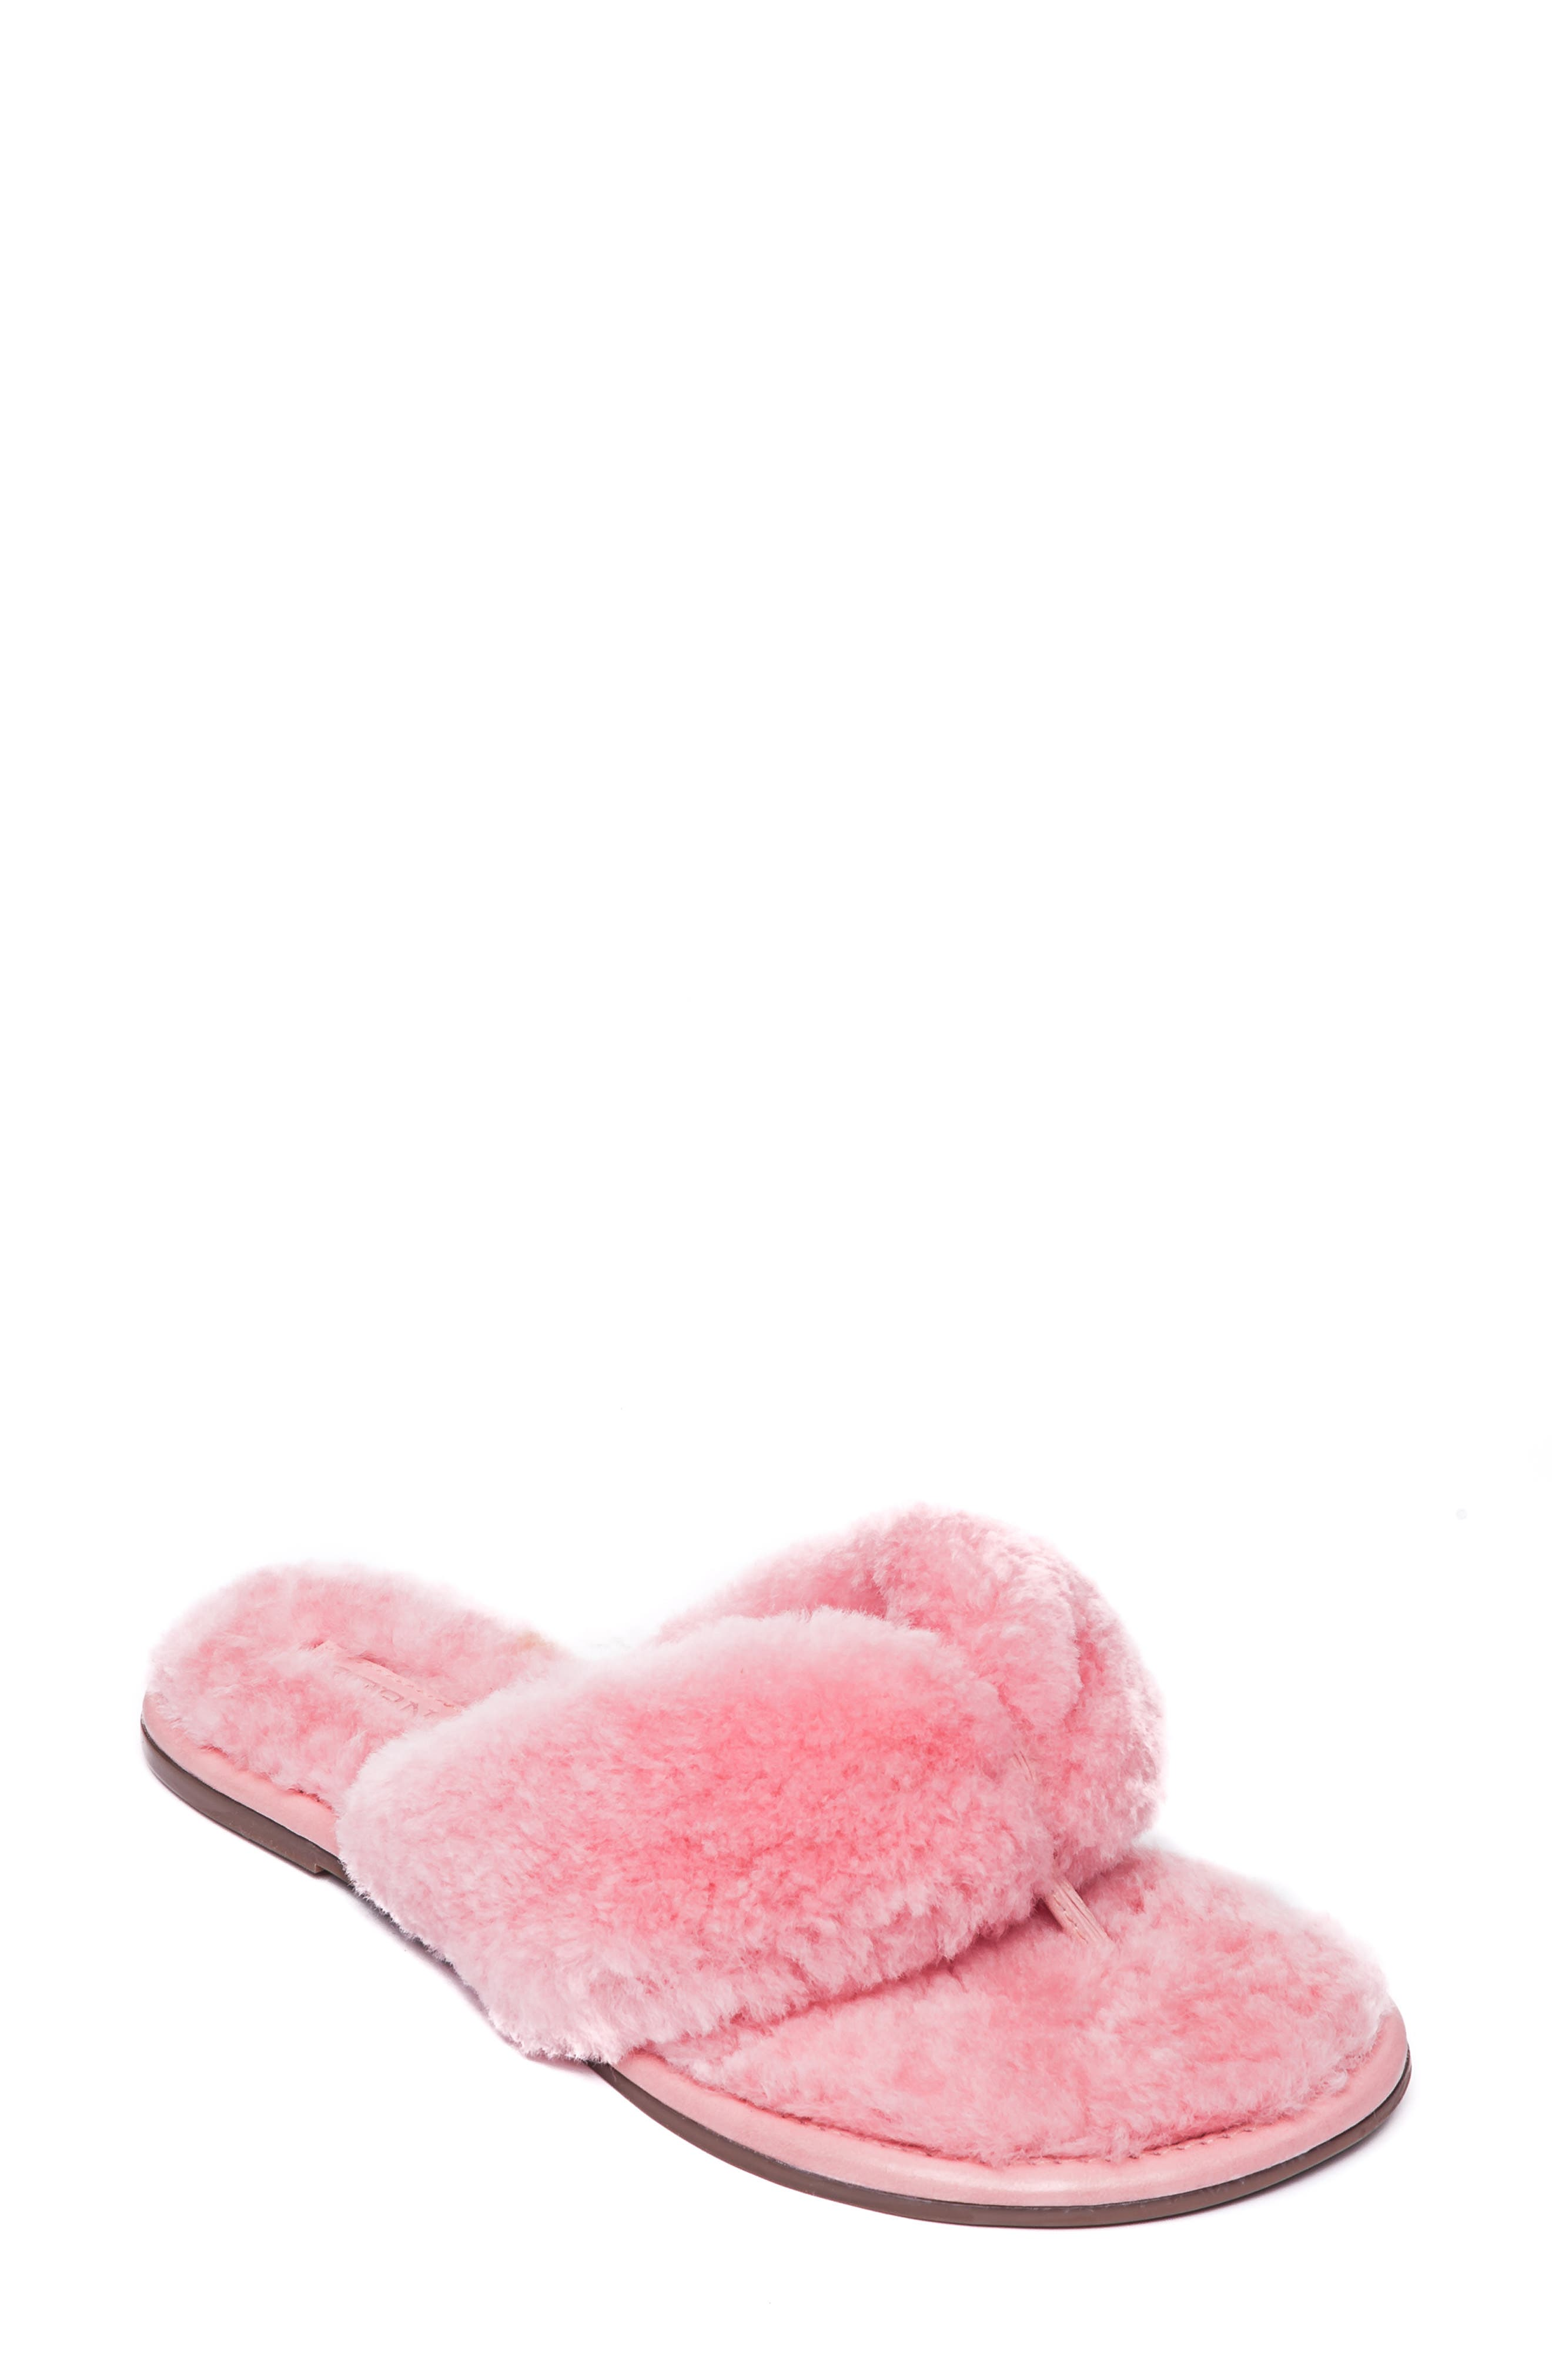 Miami Genuine Shearling Flip Flop